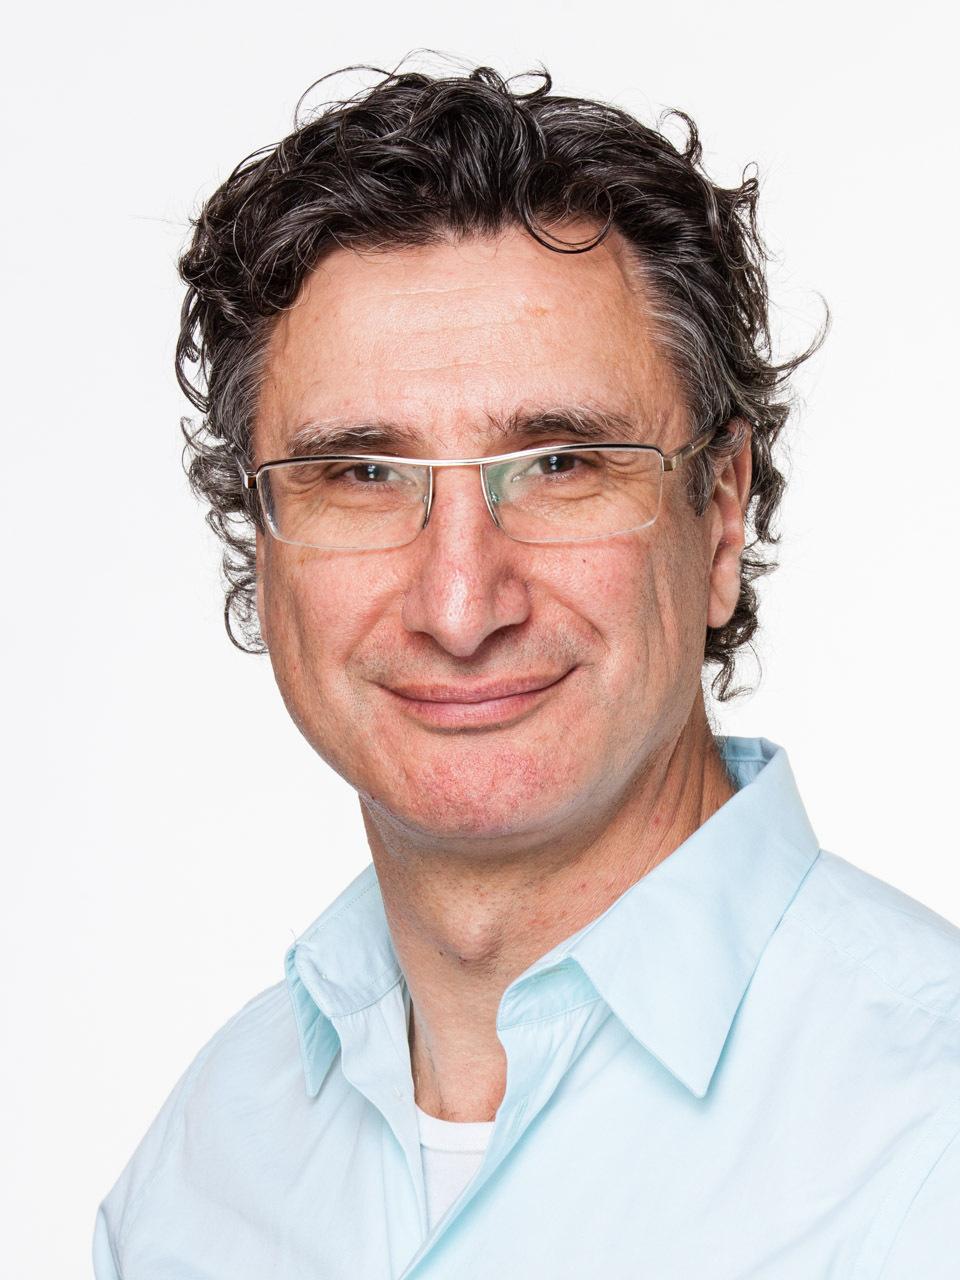 Profile picture of Nikos Papastergiadis